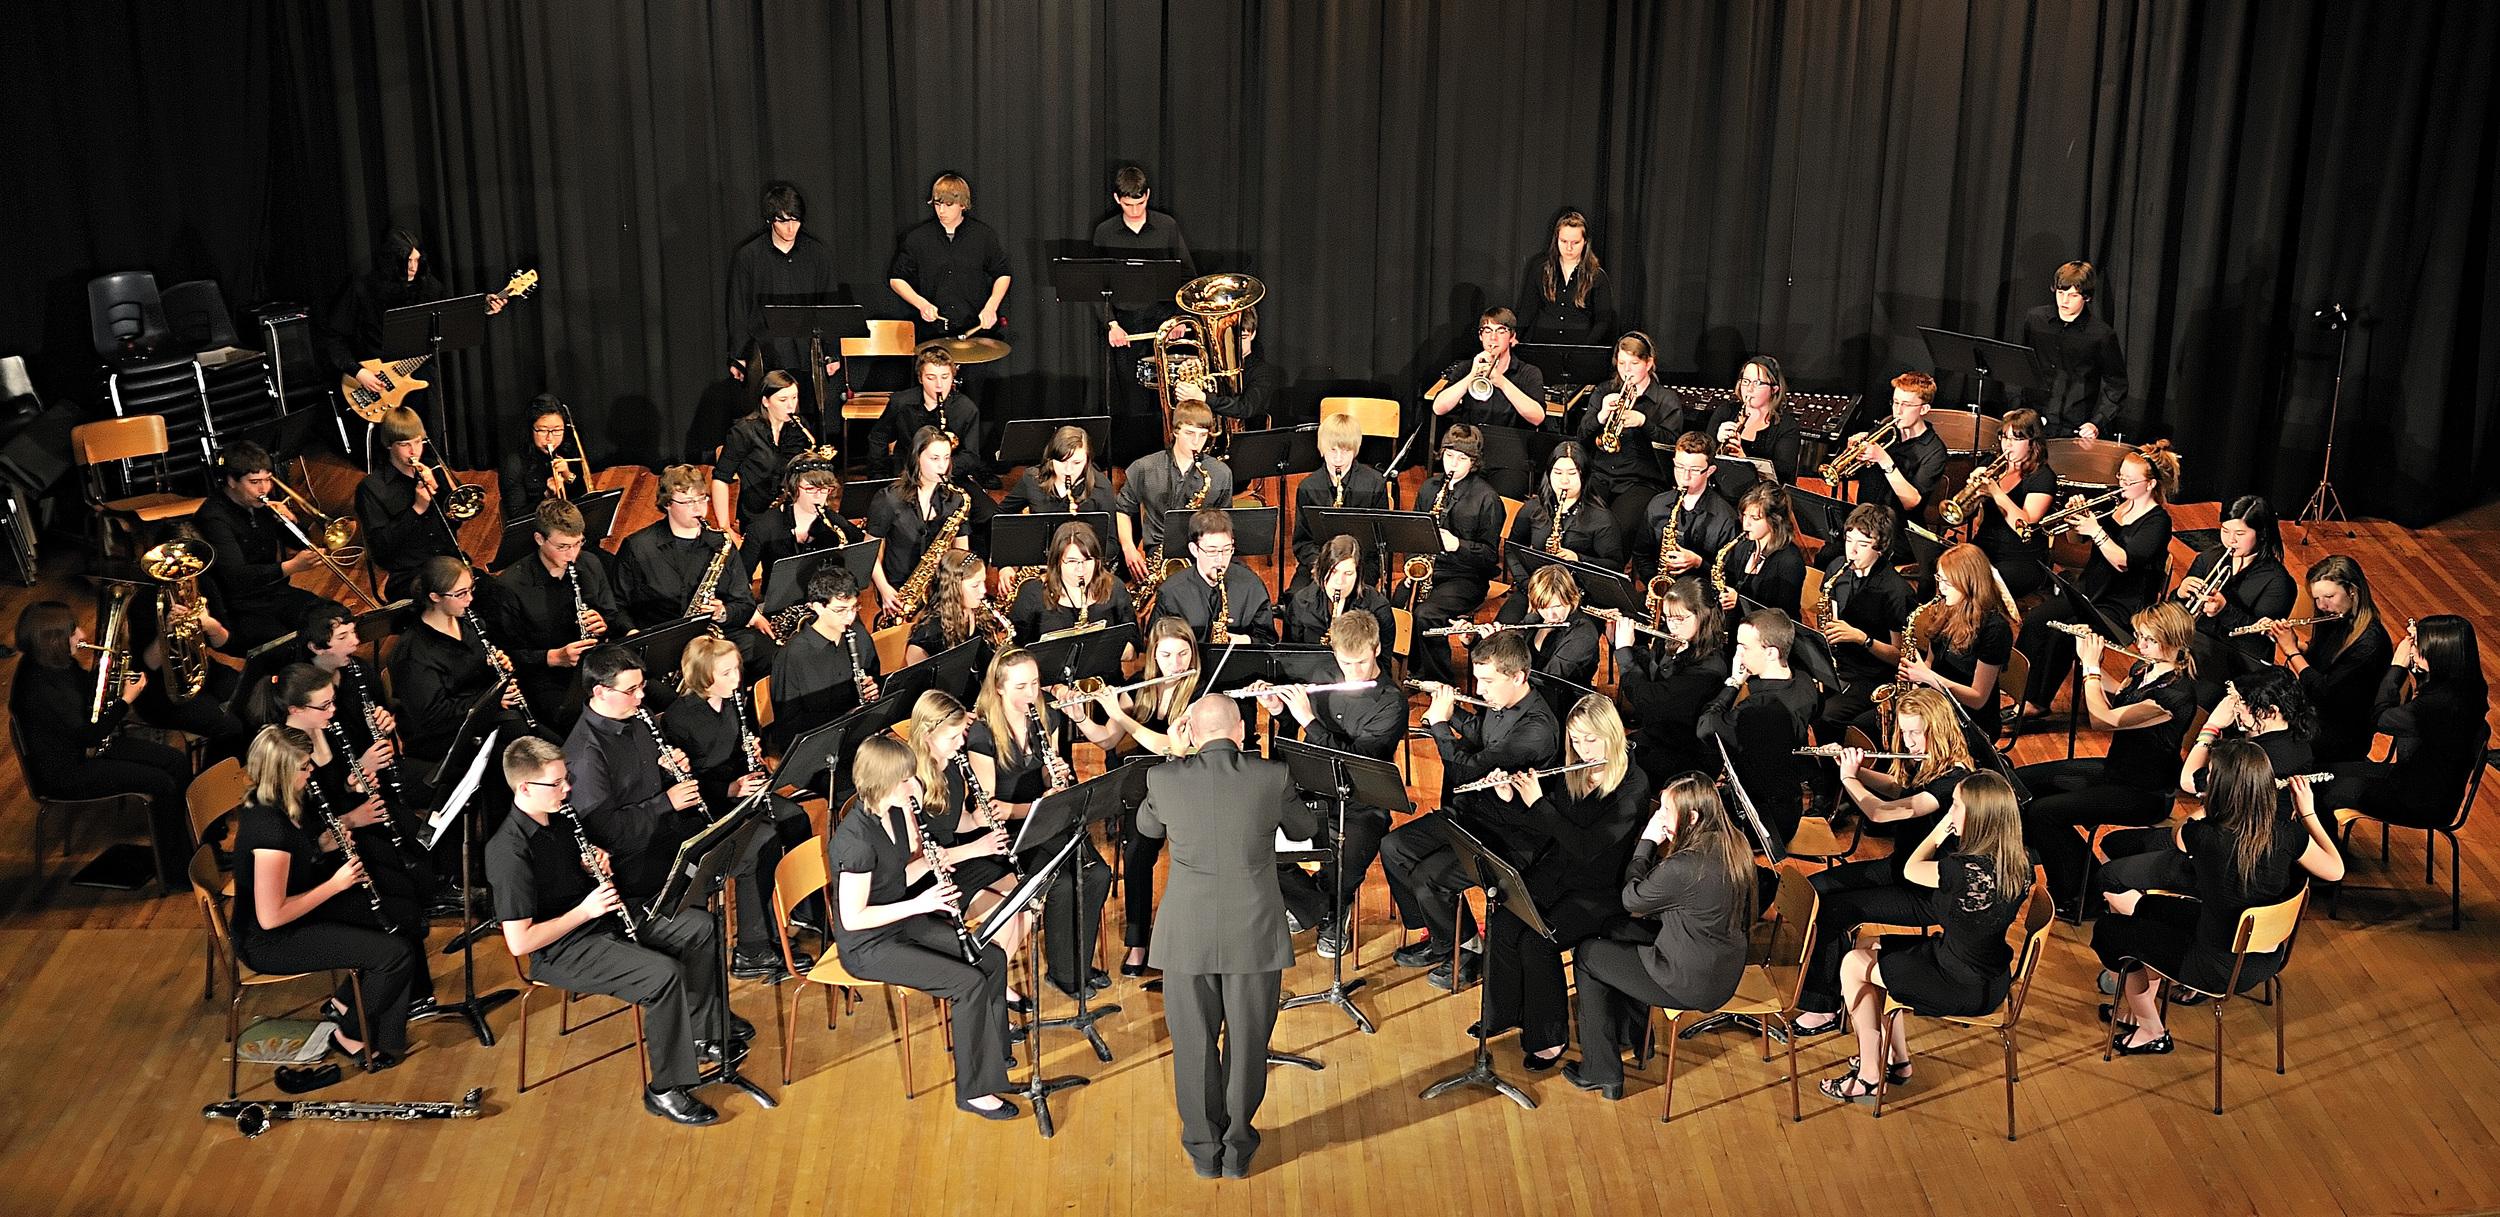 CIPA Concert Band - photo bymichaeldavies.com